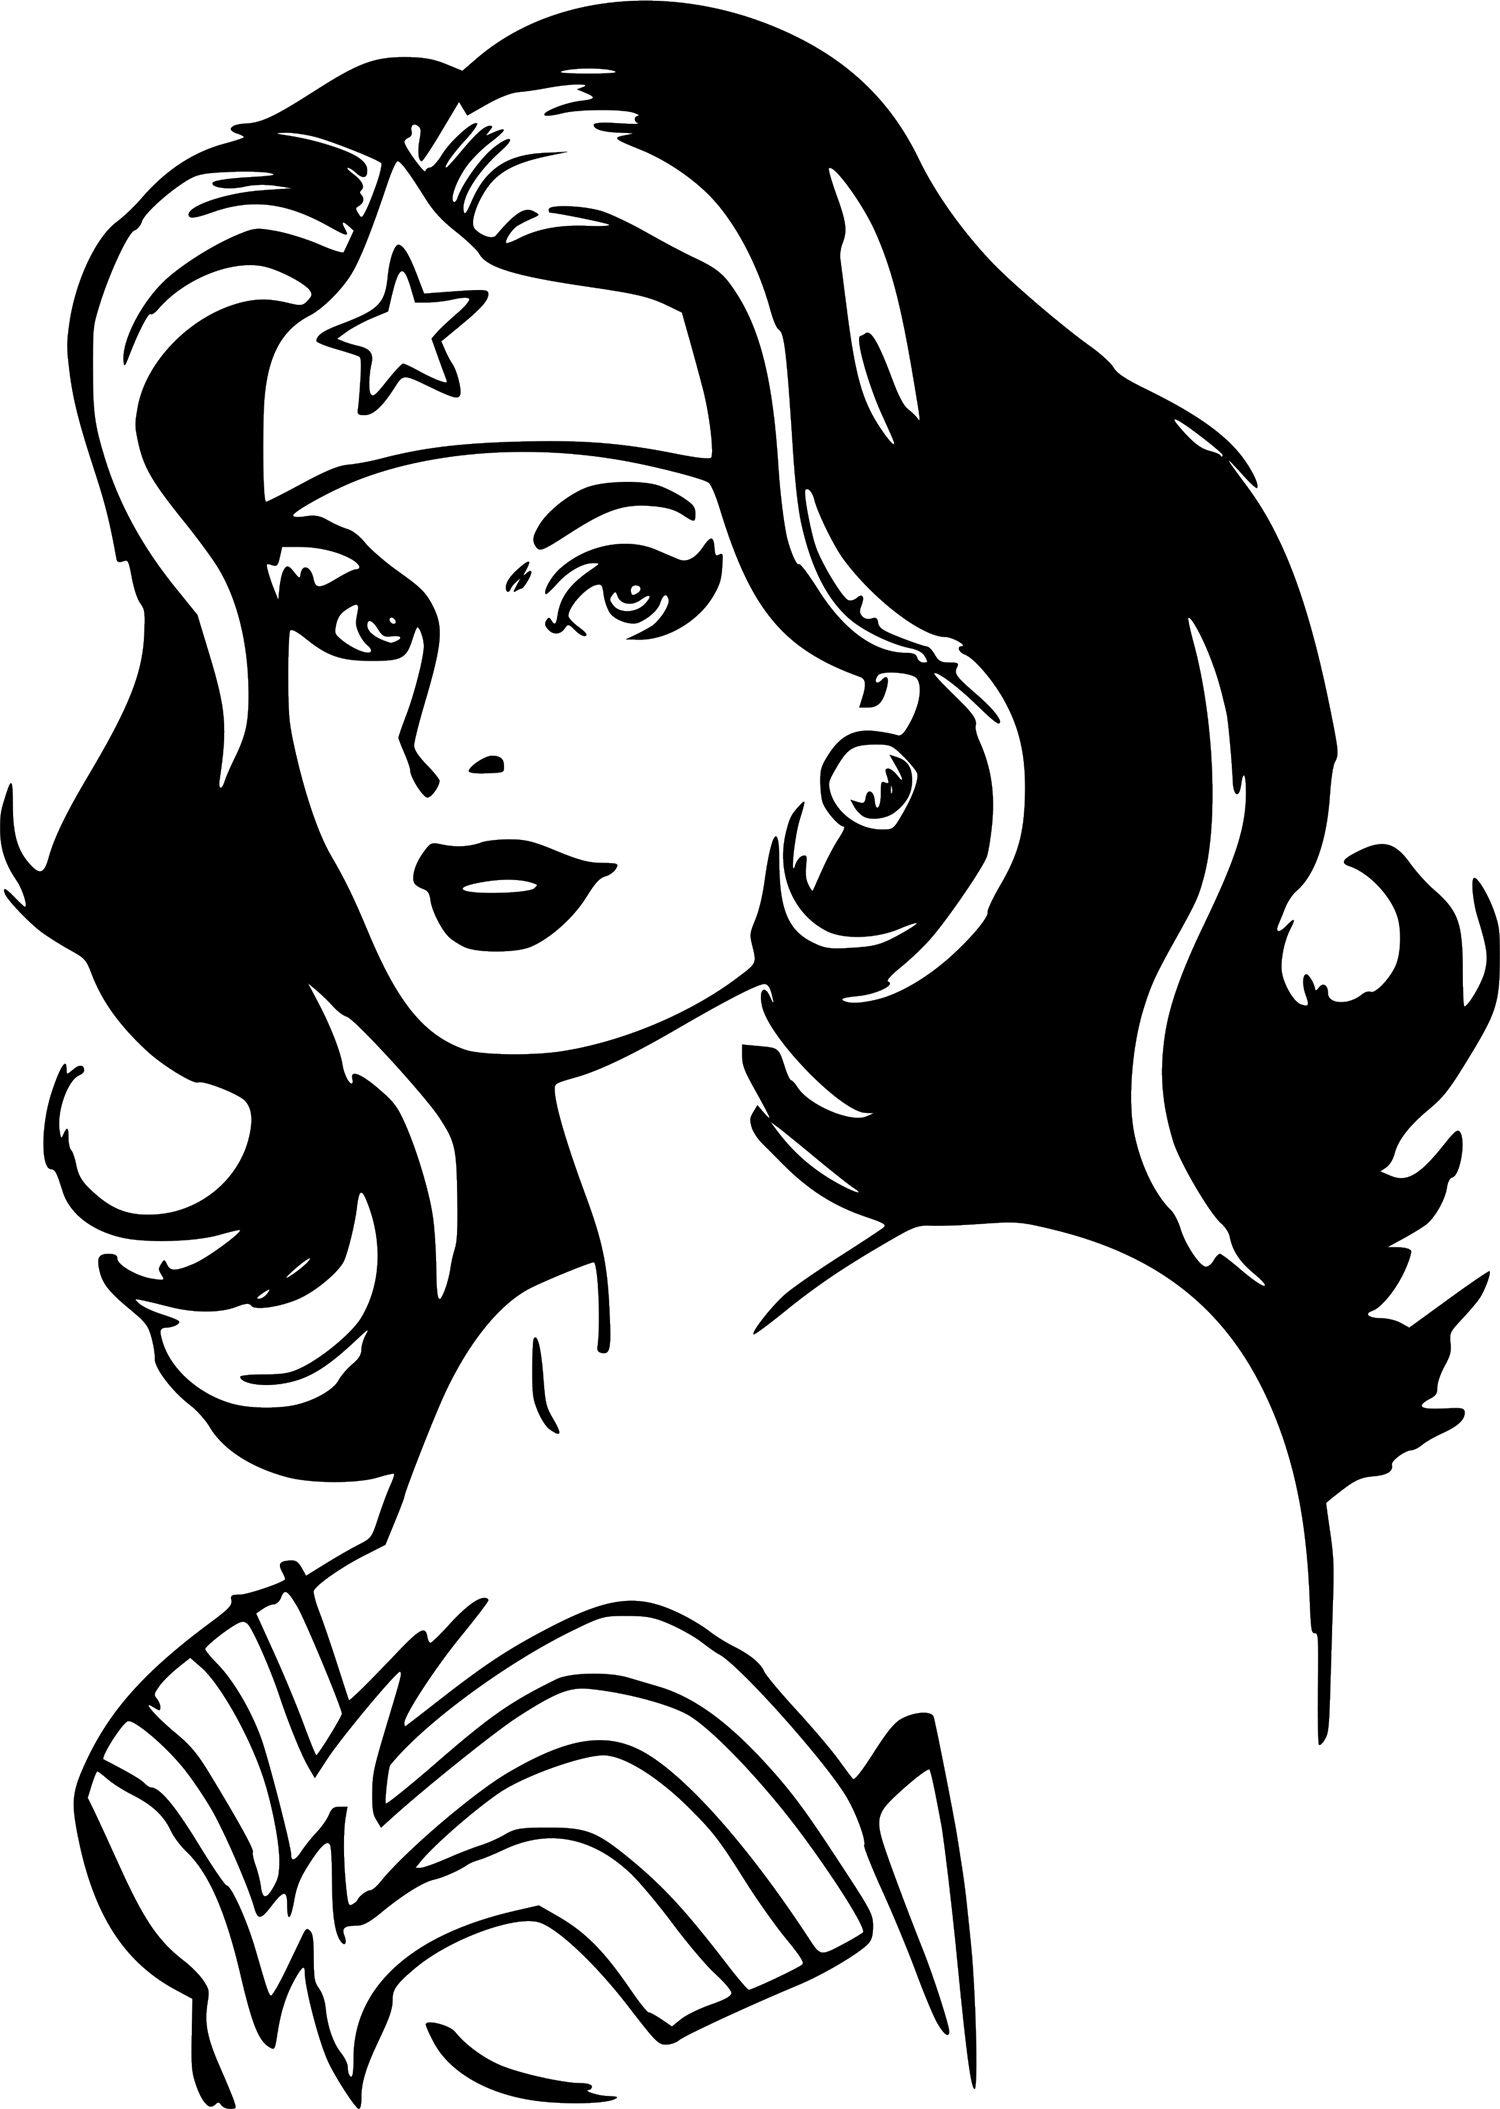 Wonder woman dc comics vinyl sticker decal